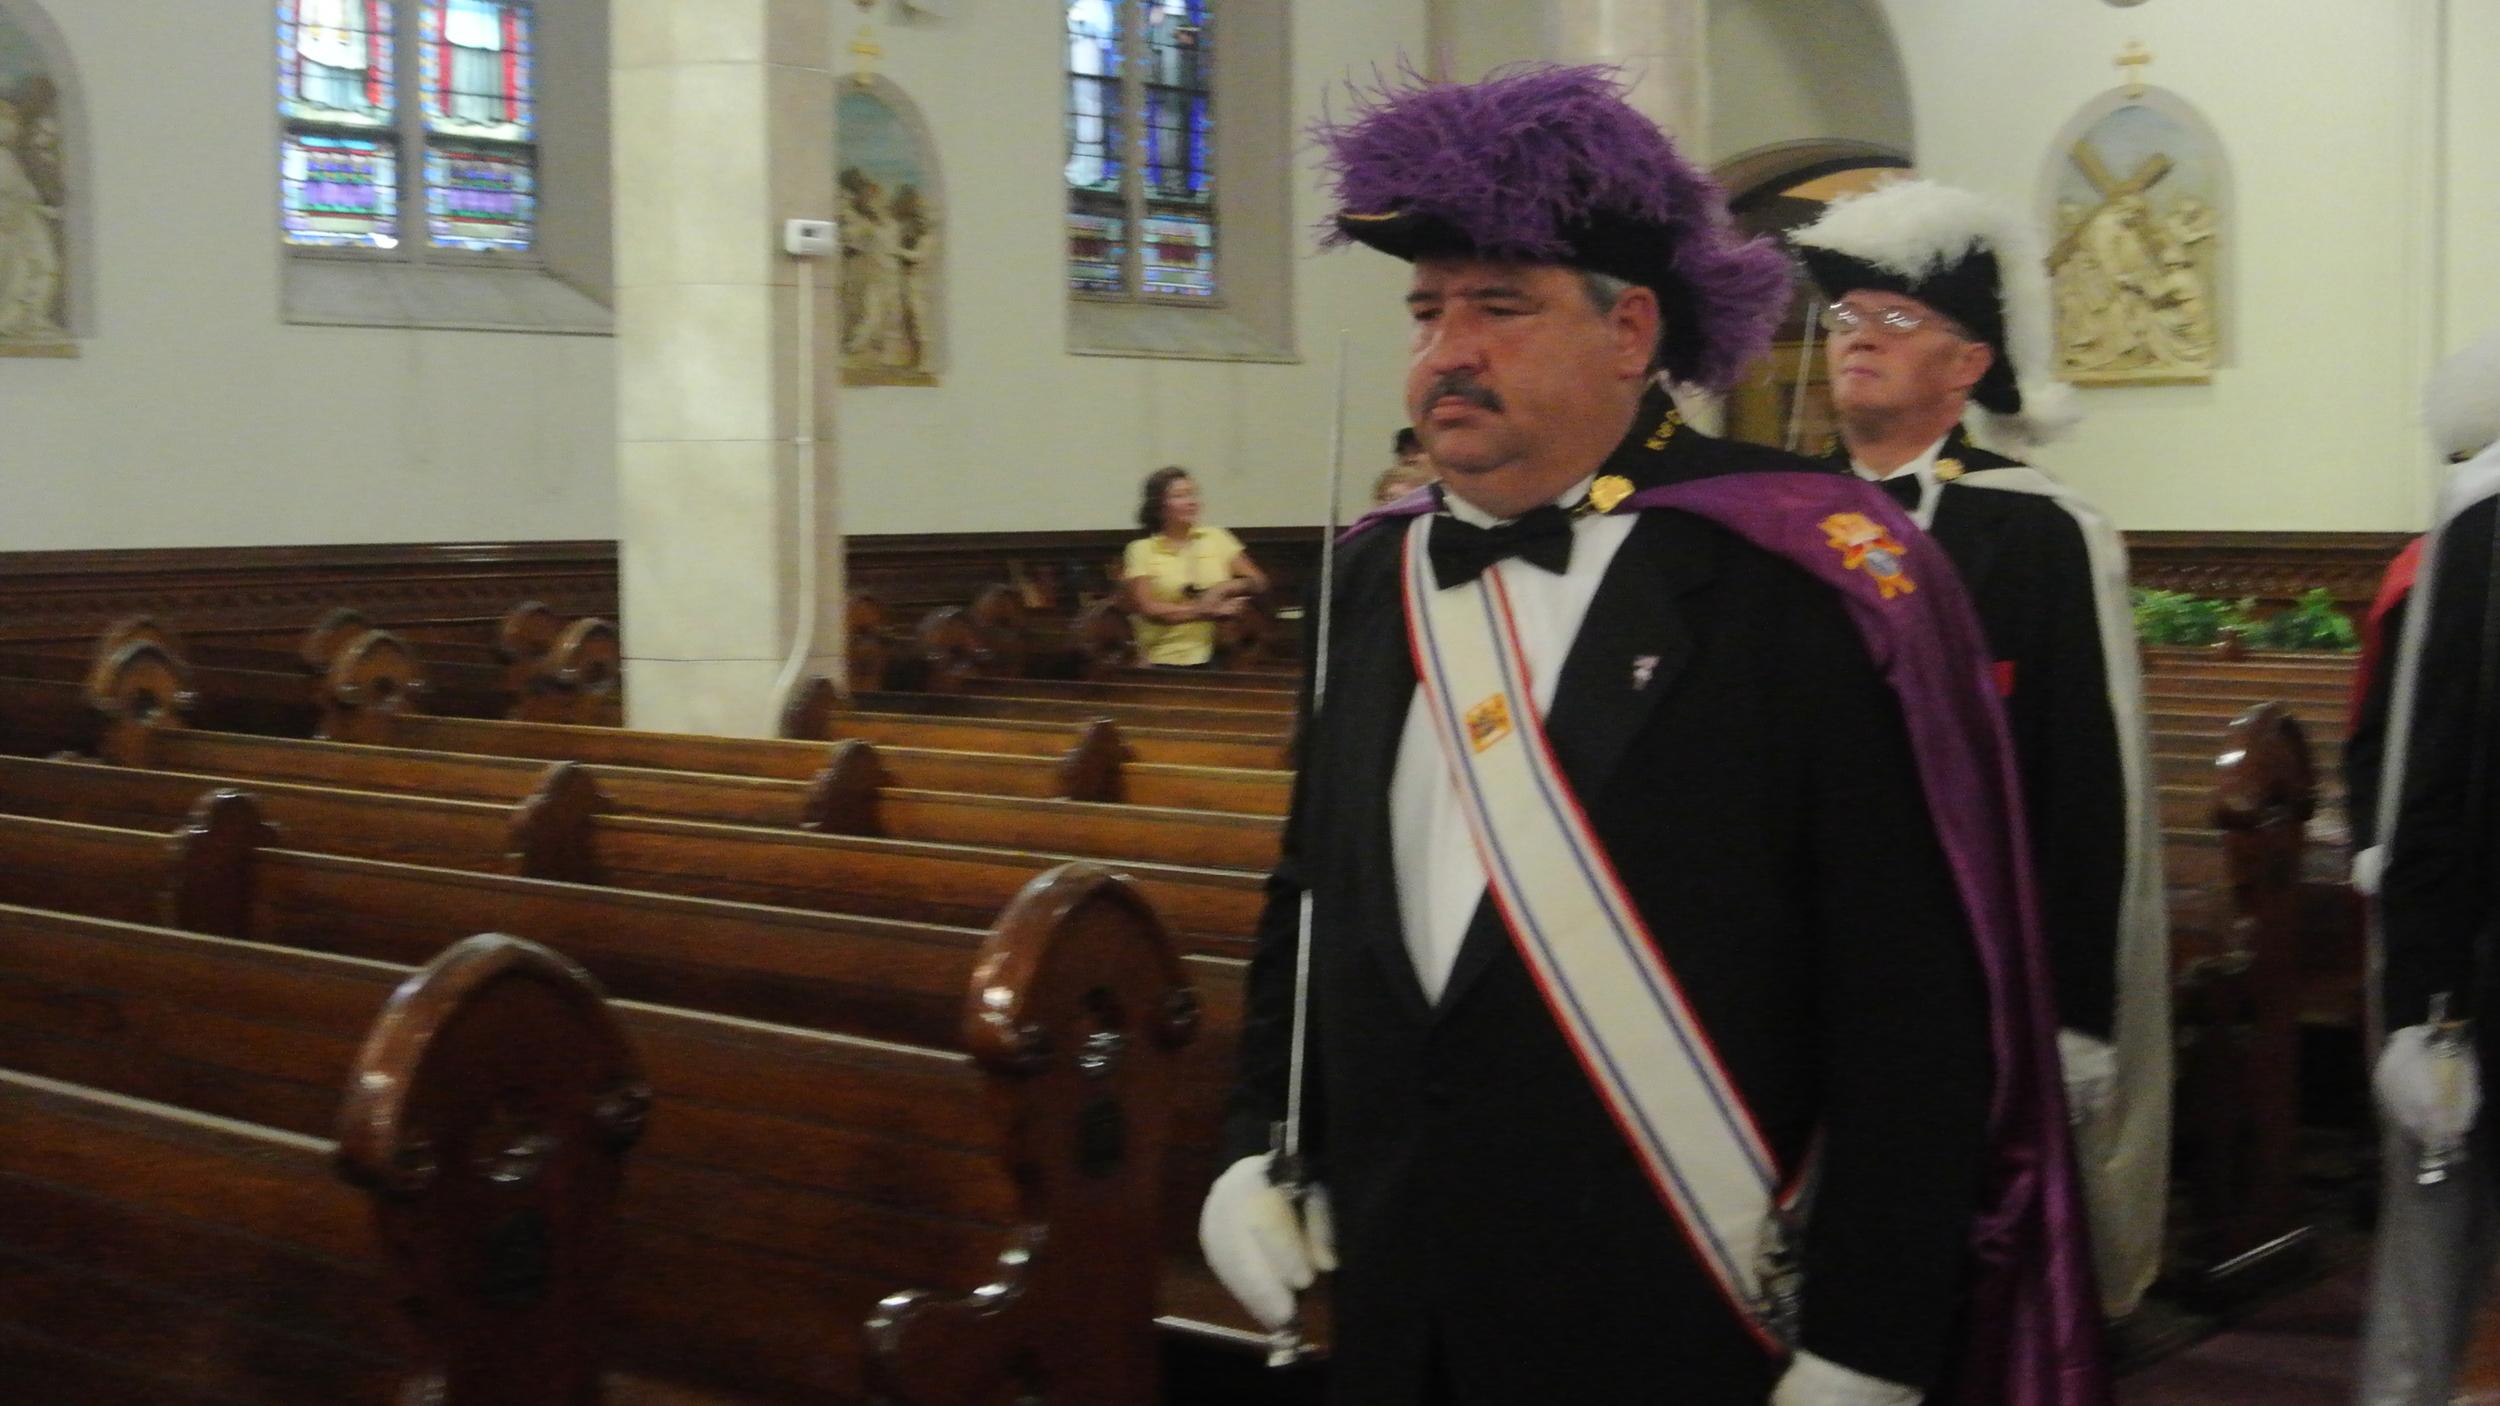 Knights of Columbus Honor Guard